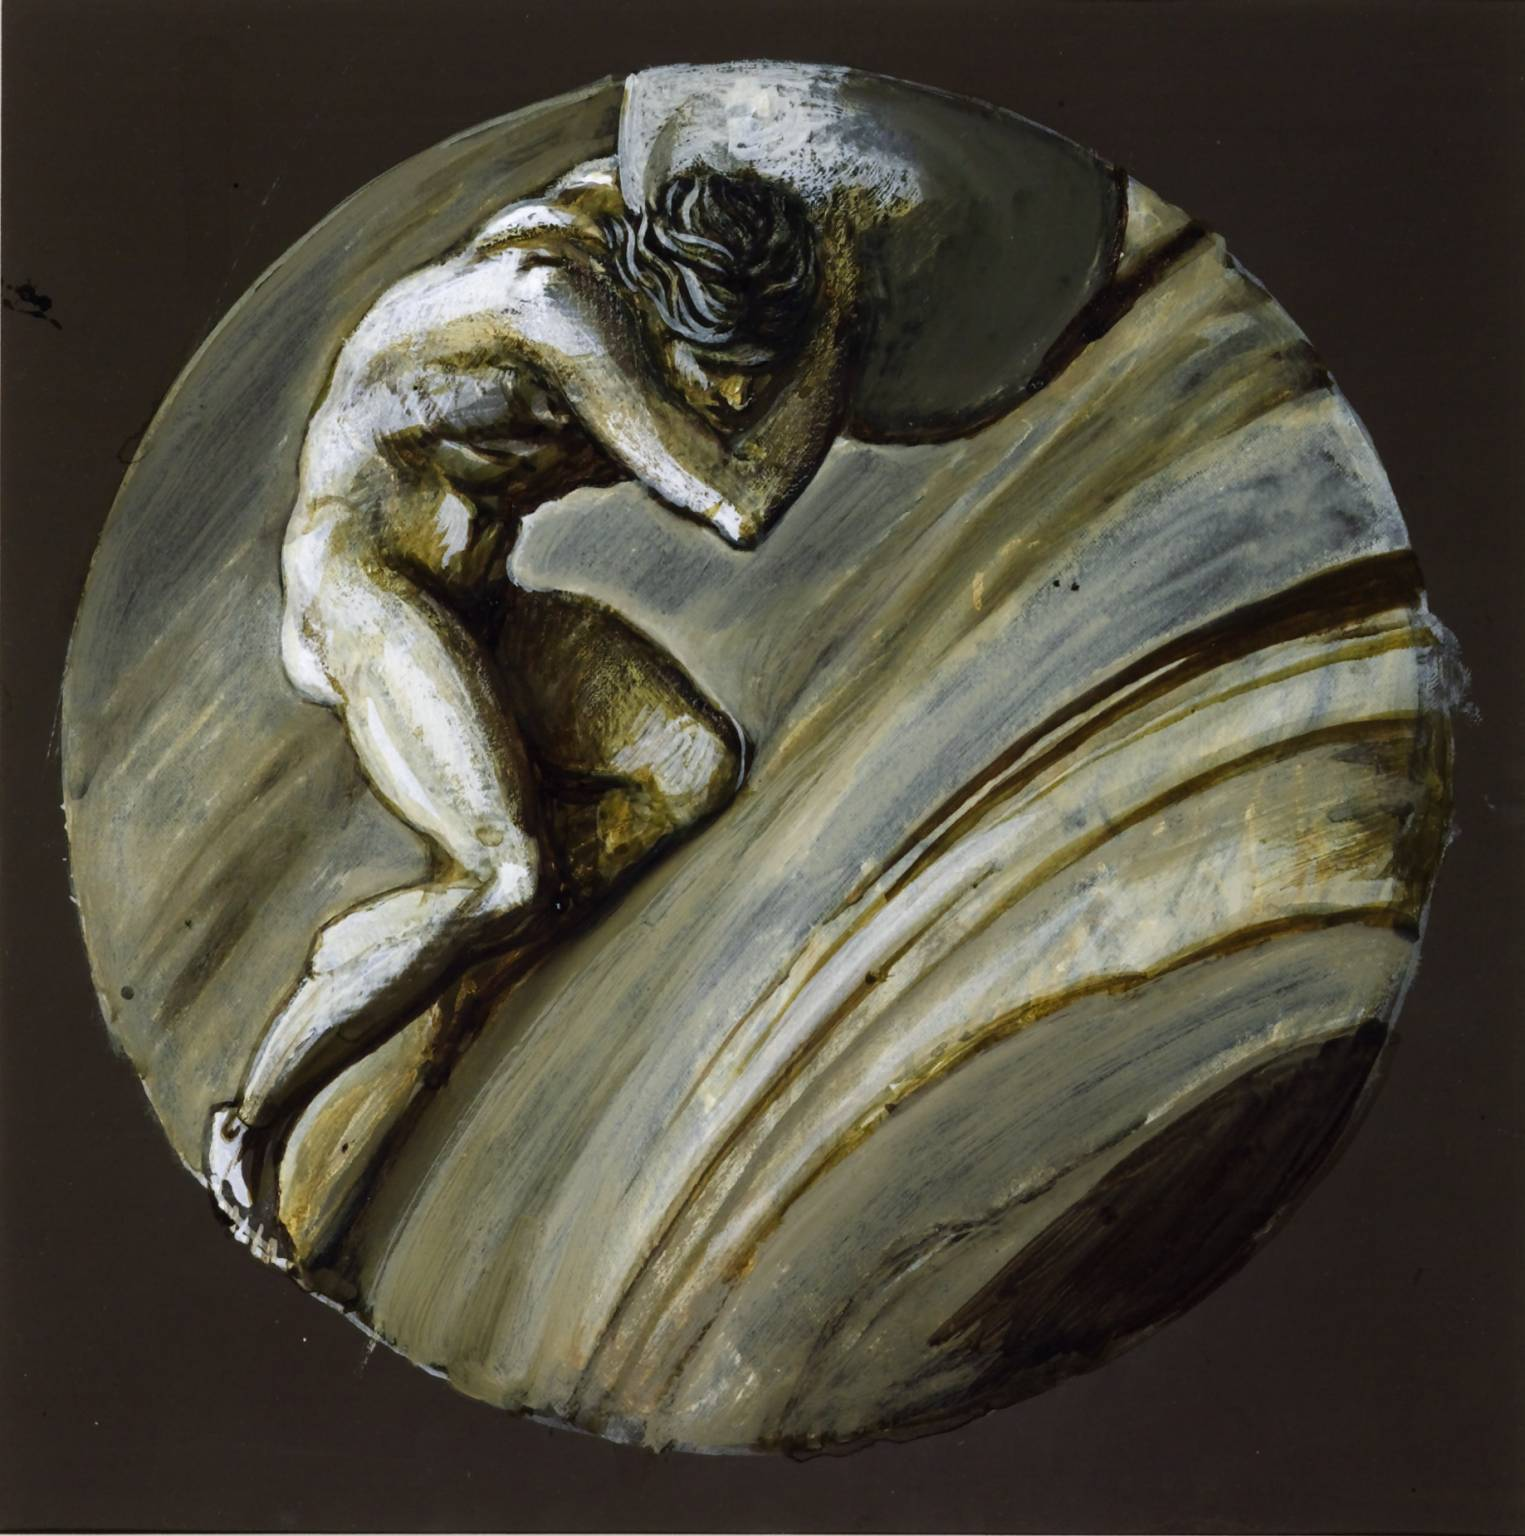 Myth of Sisyphus Art Greek Myth Sisyphus Was